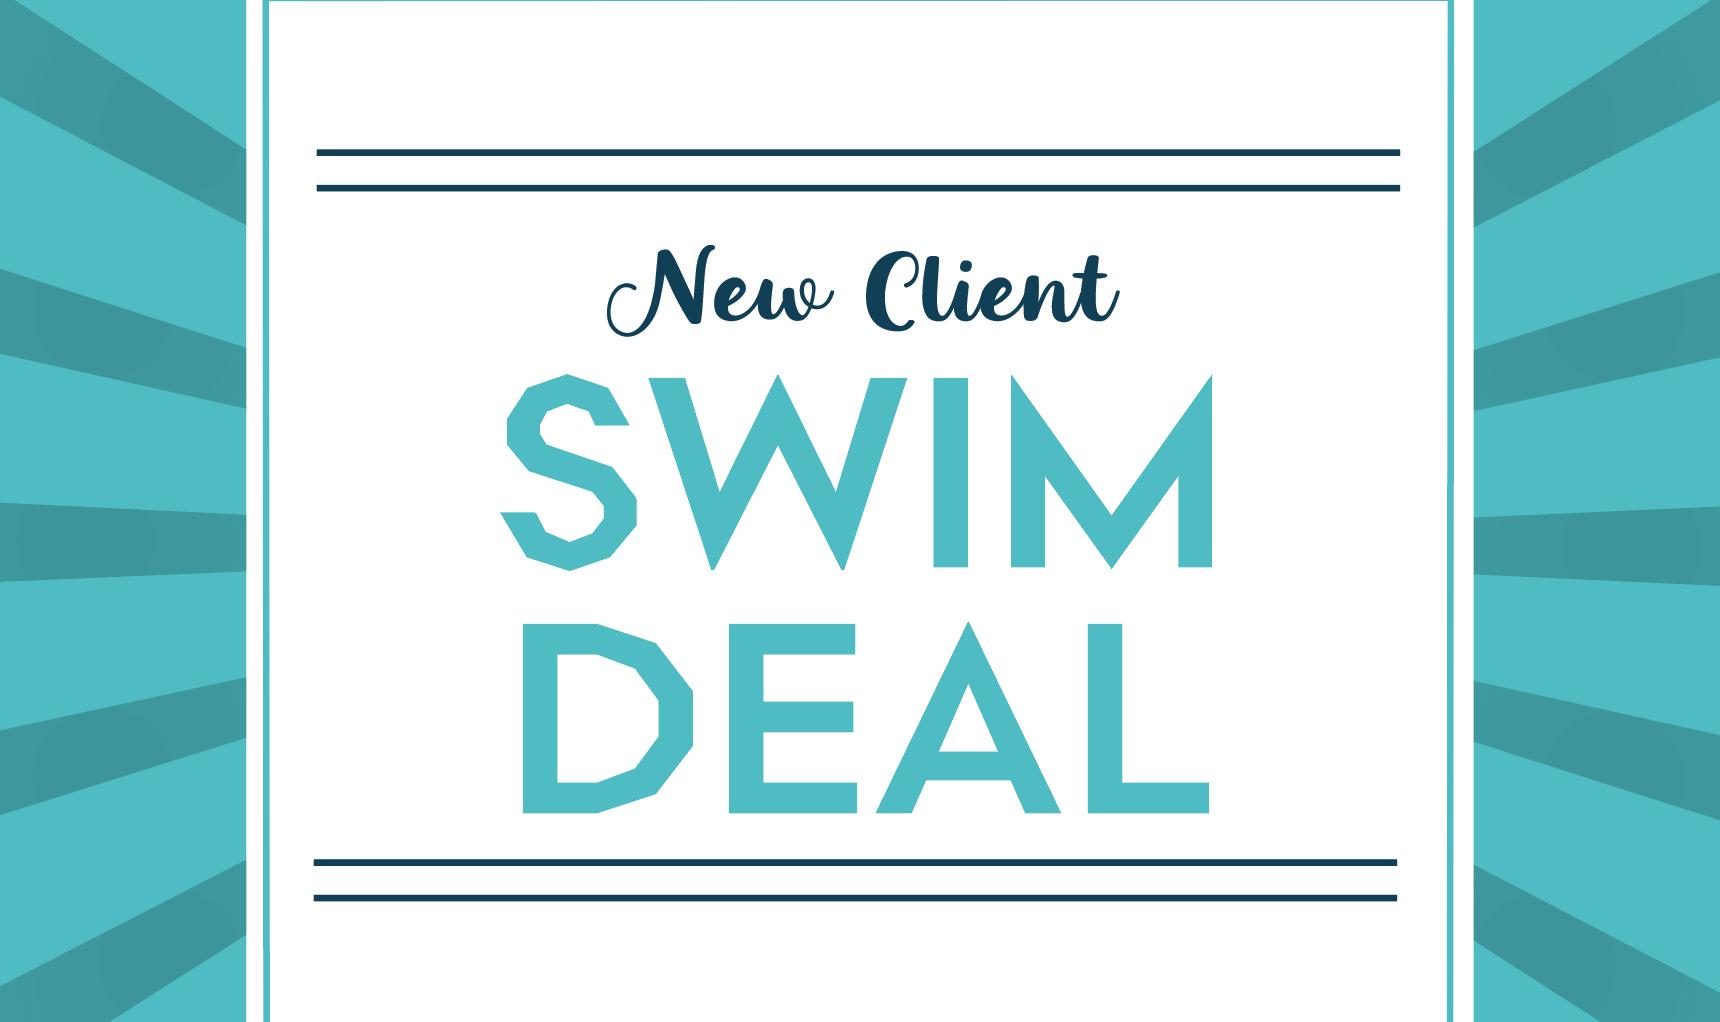 New Client Swim Deal Castle Hill Fitness 360